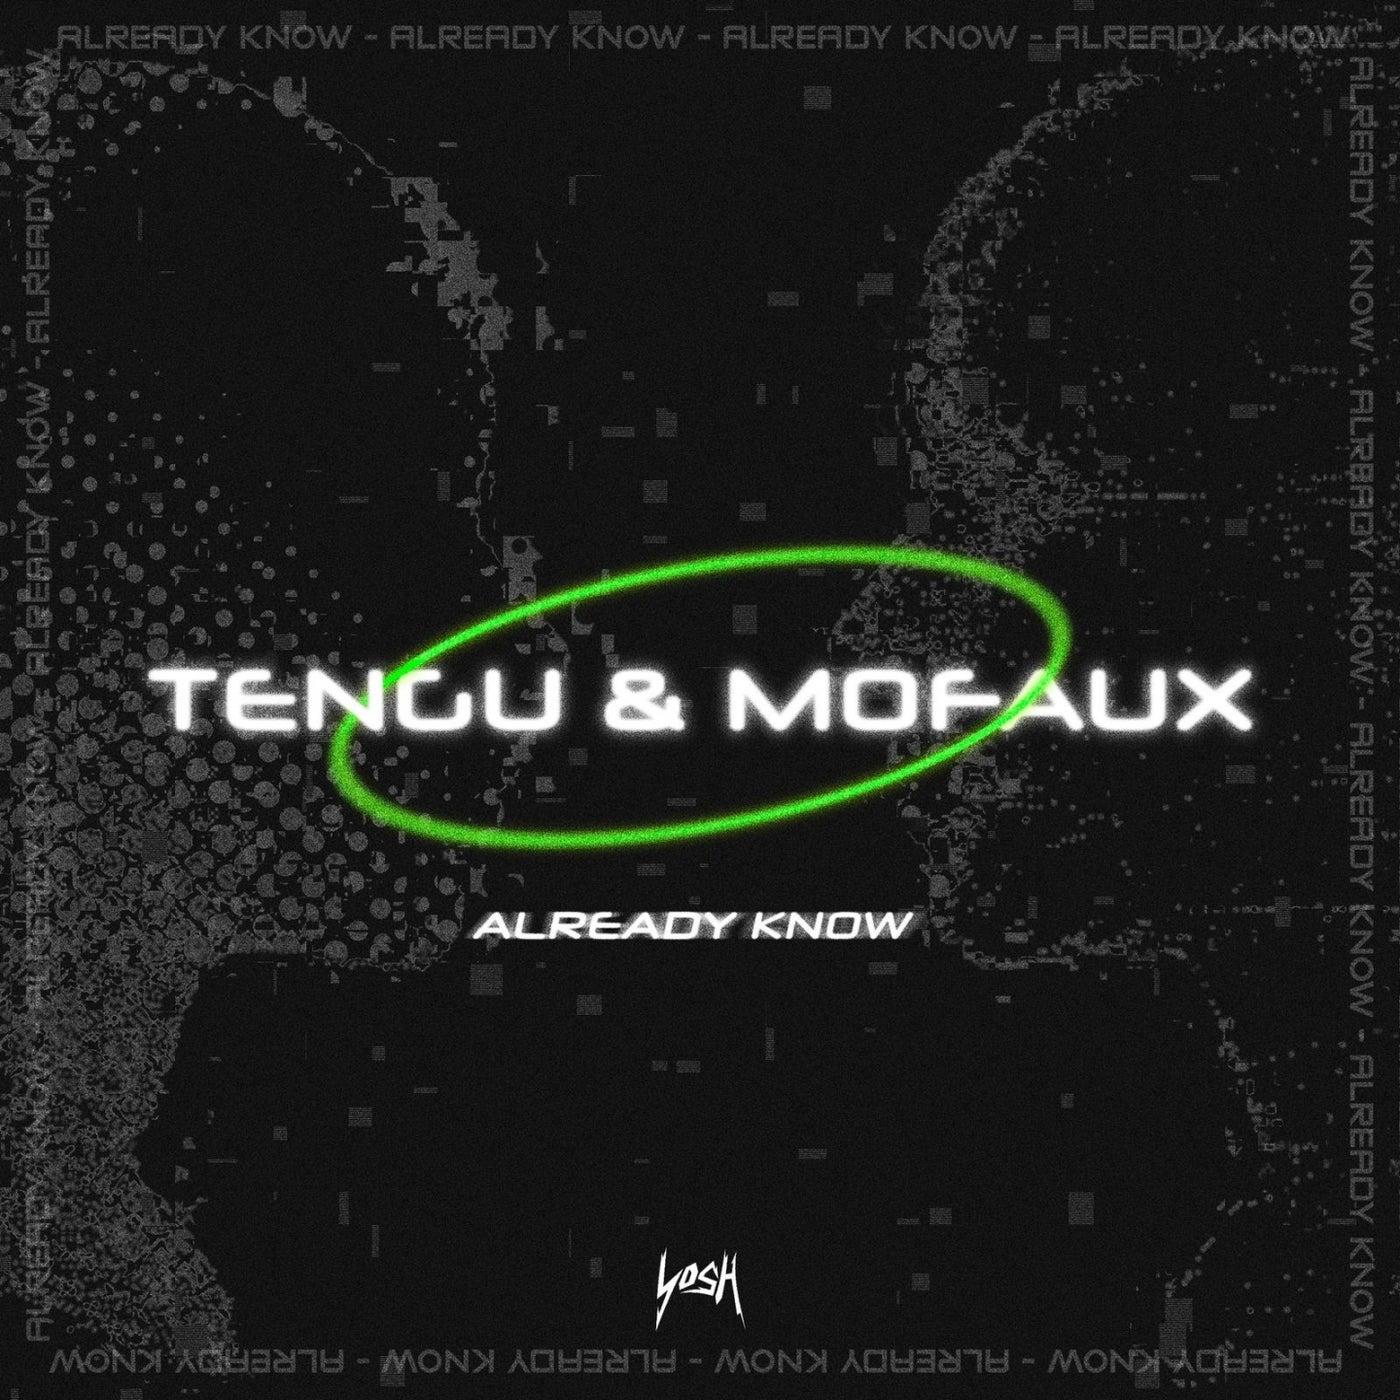 Already Know (Original Mix)